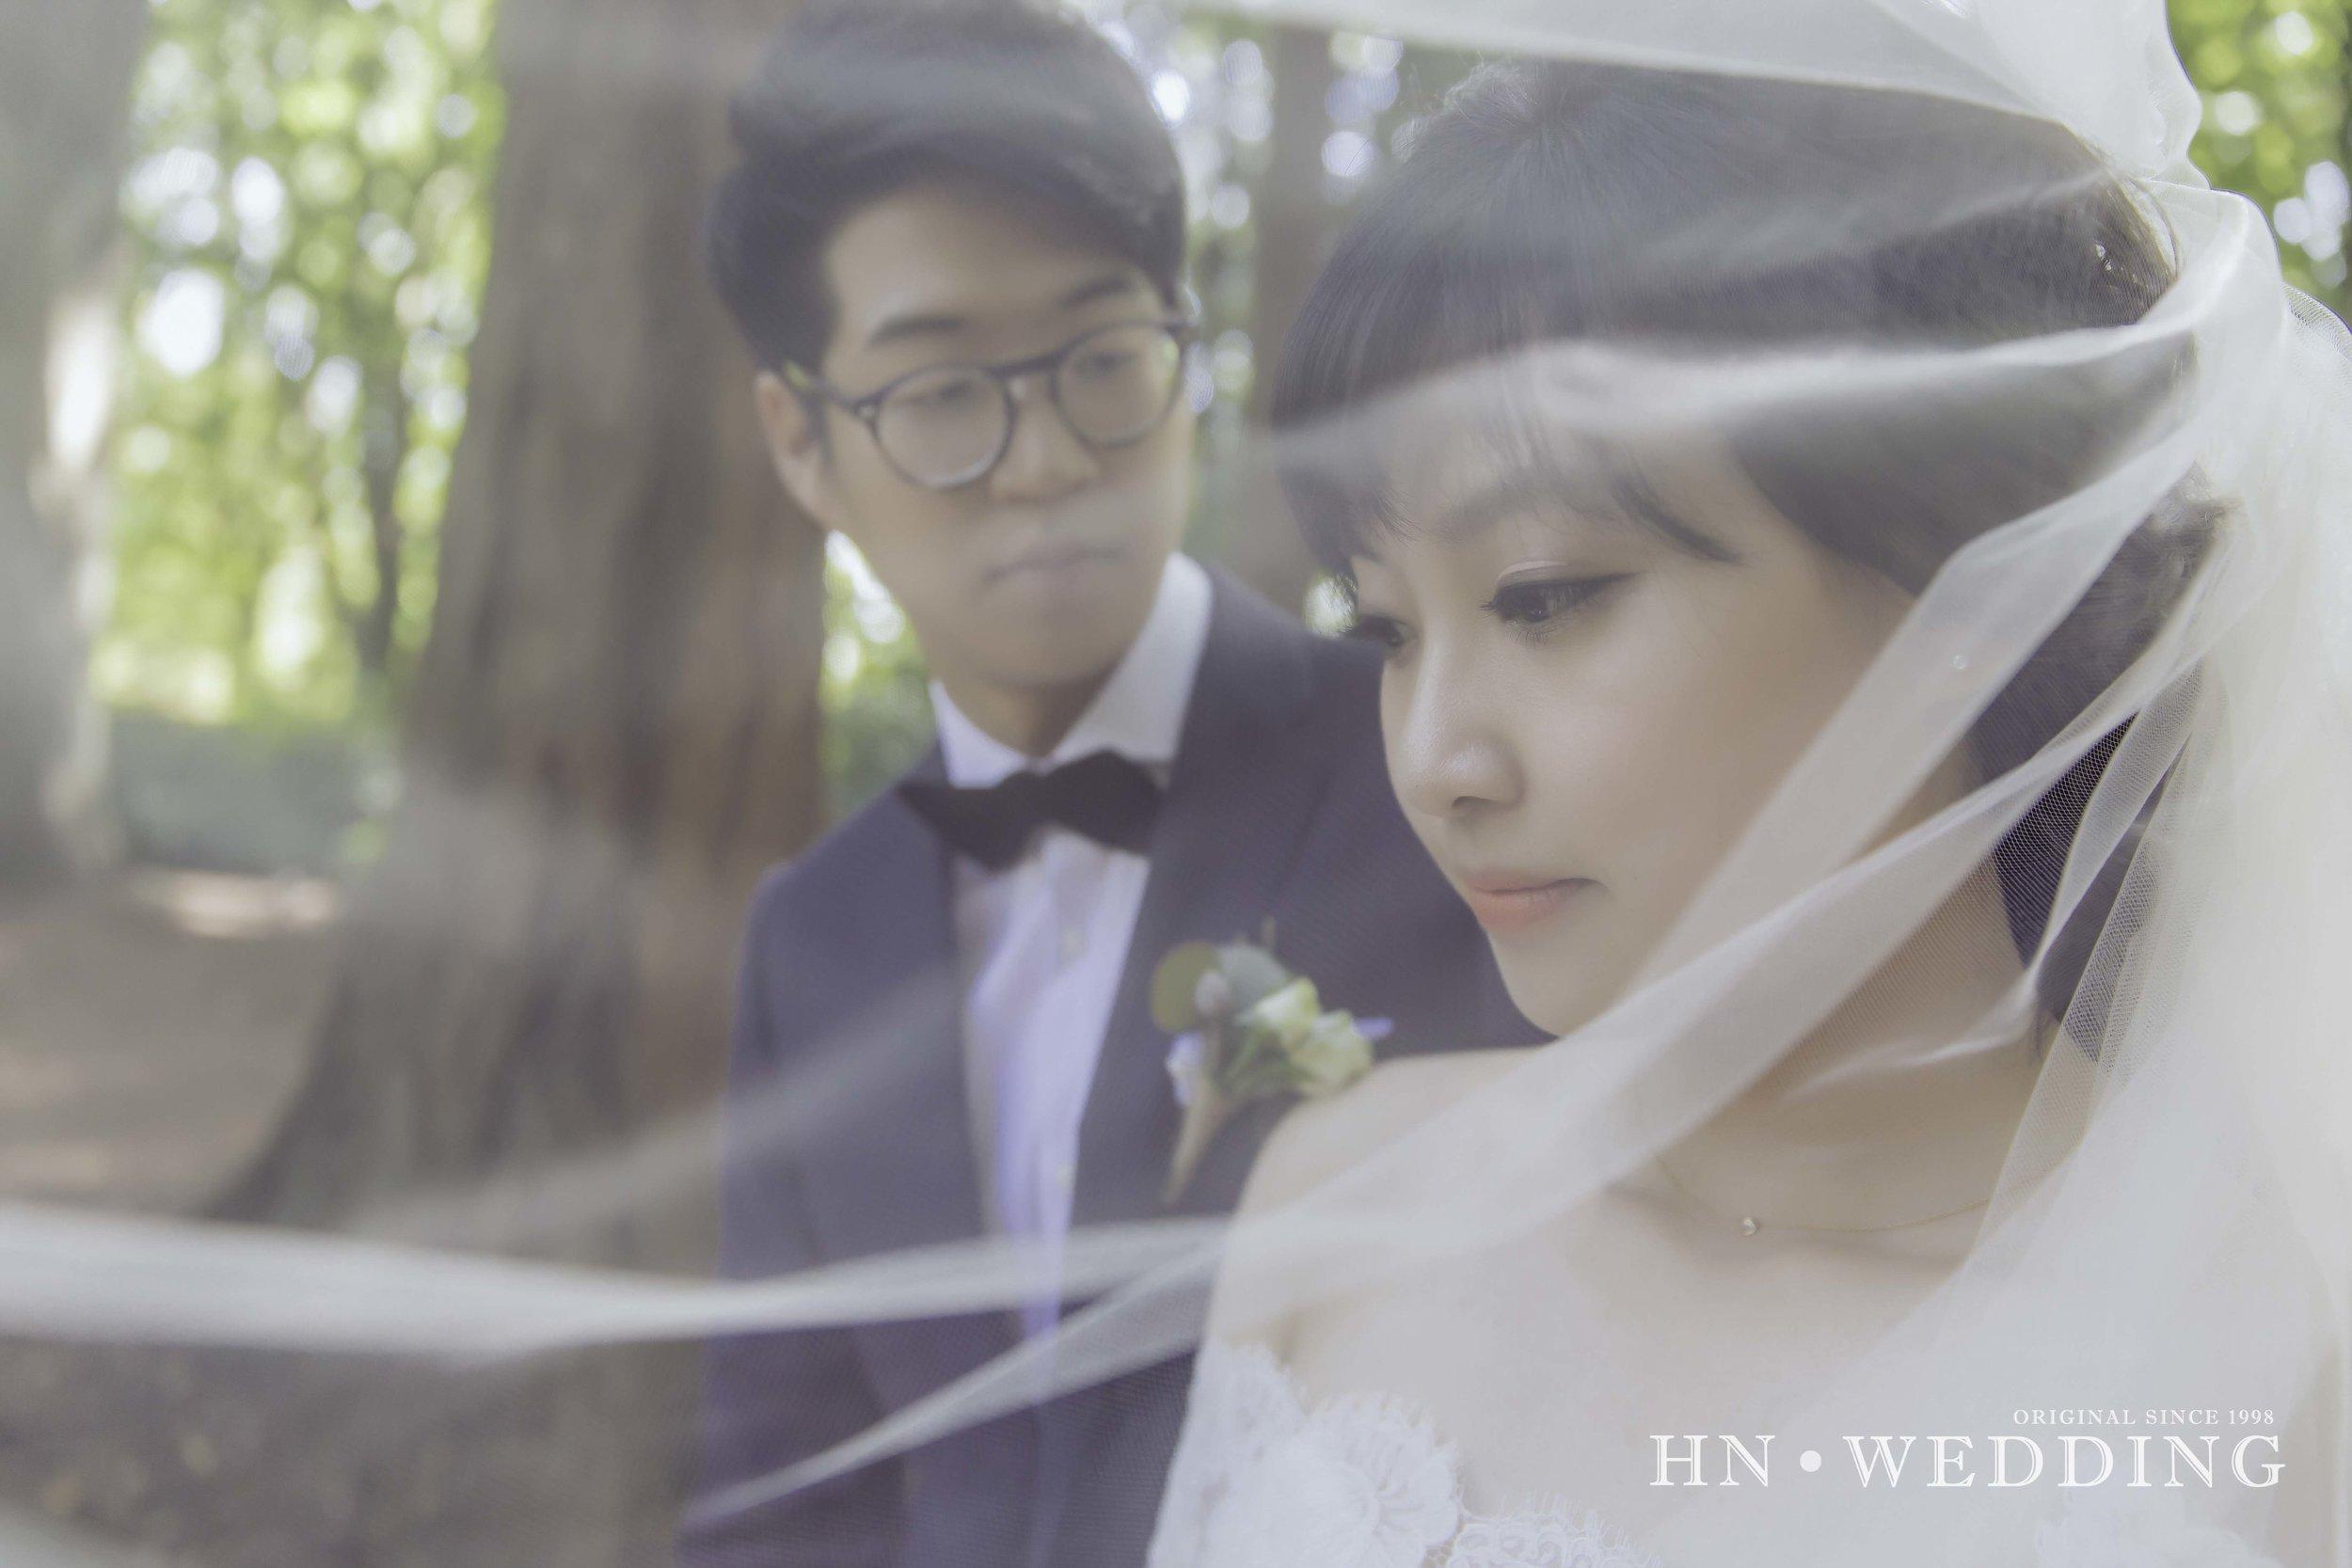 HNwedding-20160826-wedding-1385.jpg